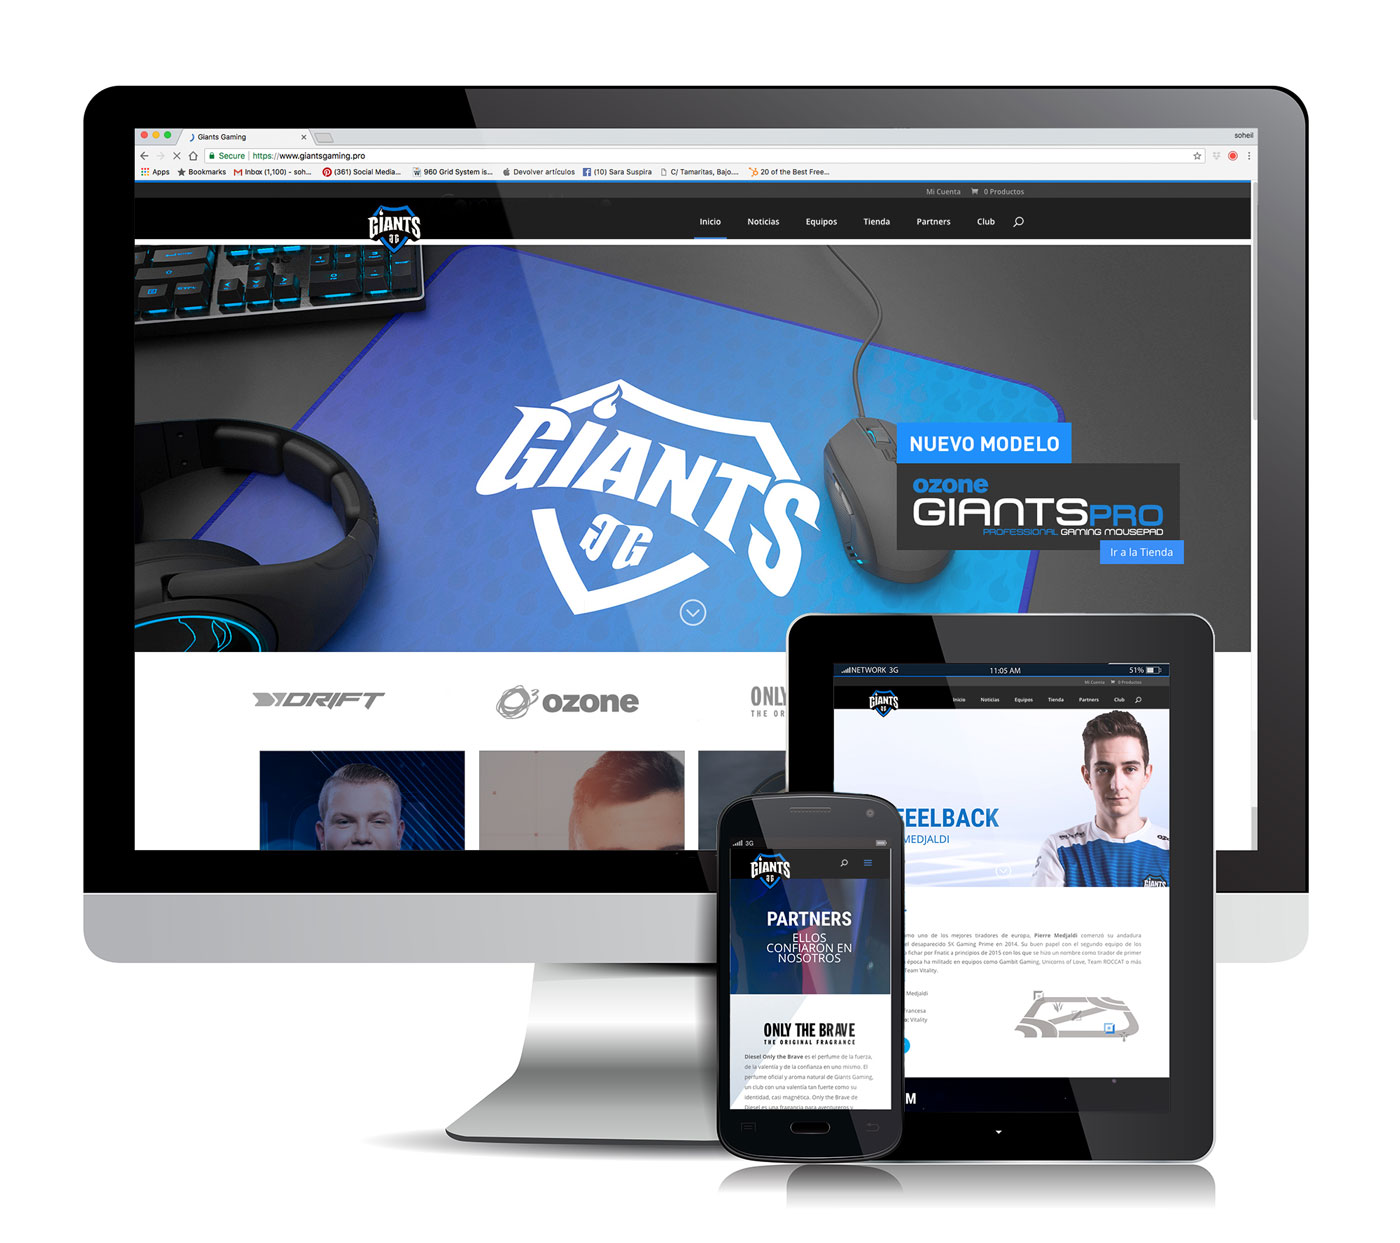 GiantsGaming.pro